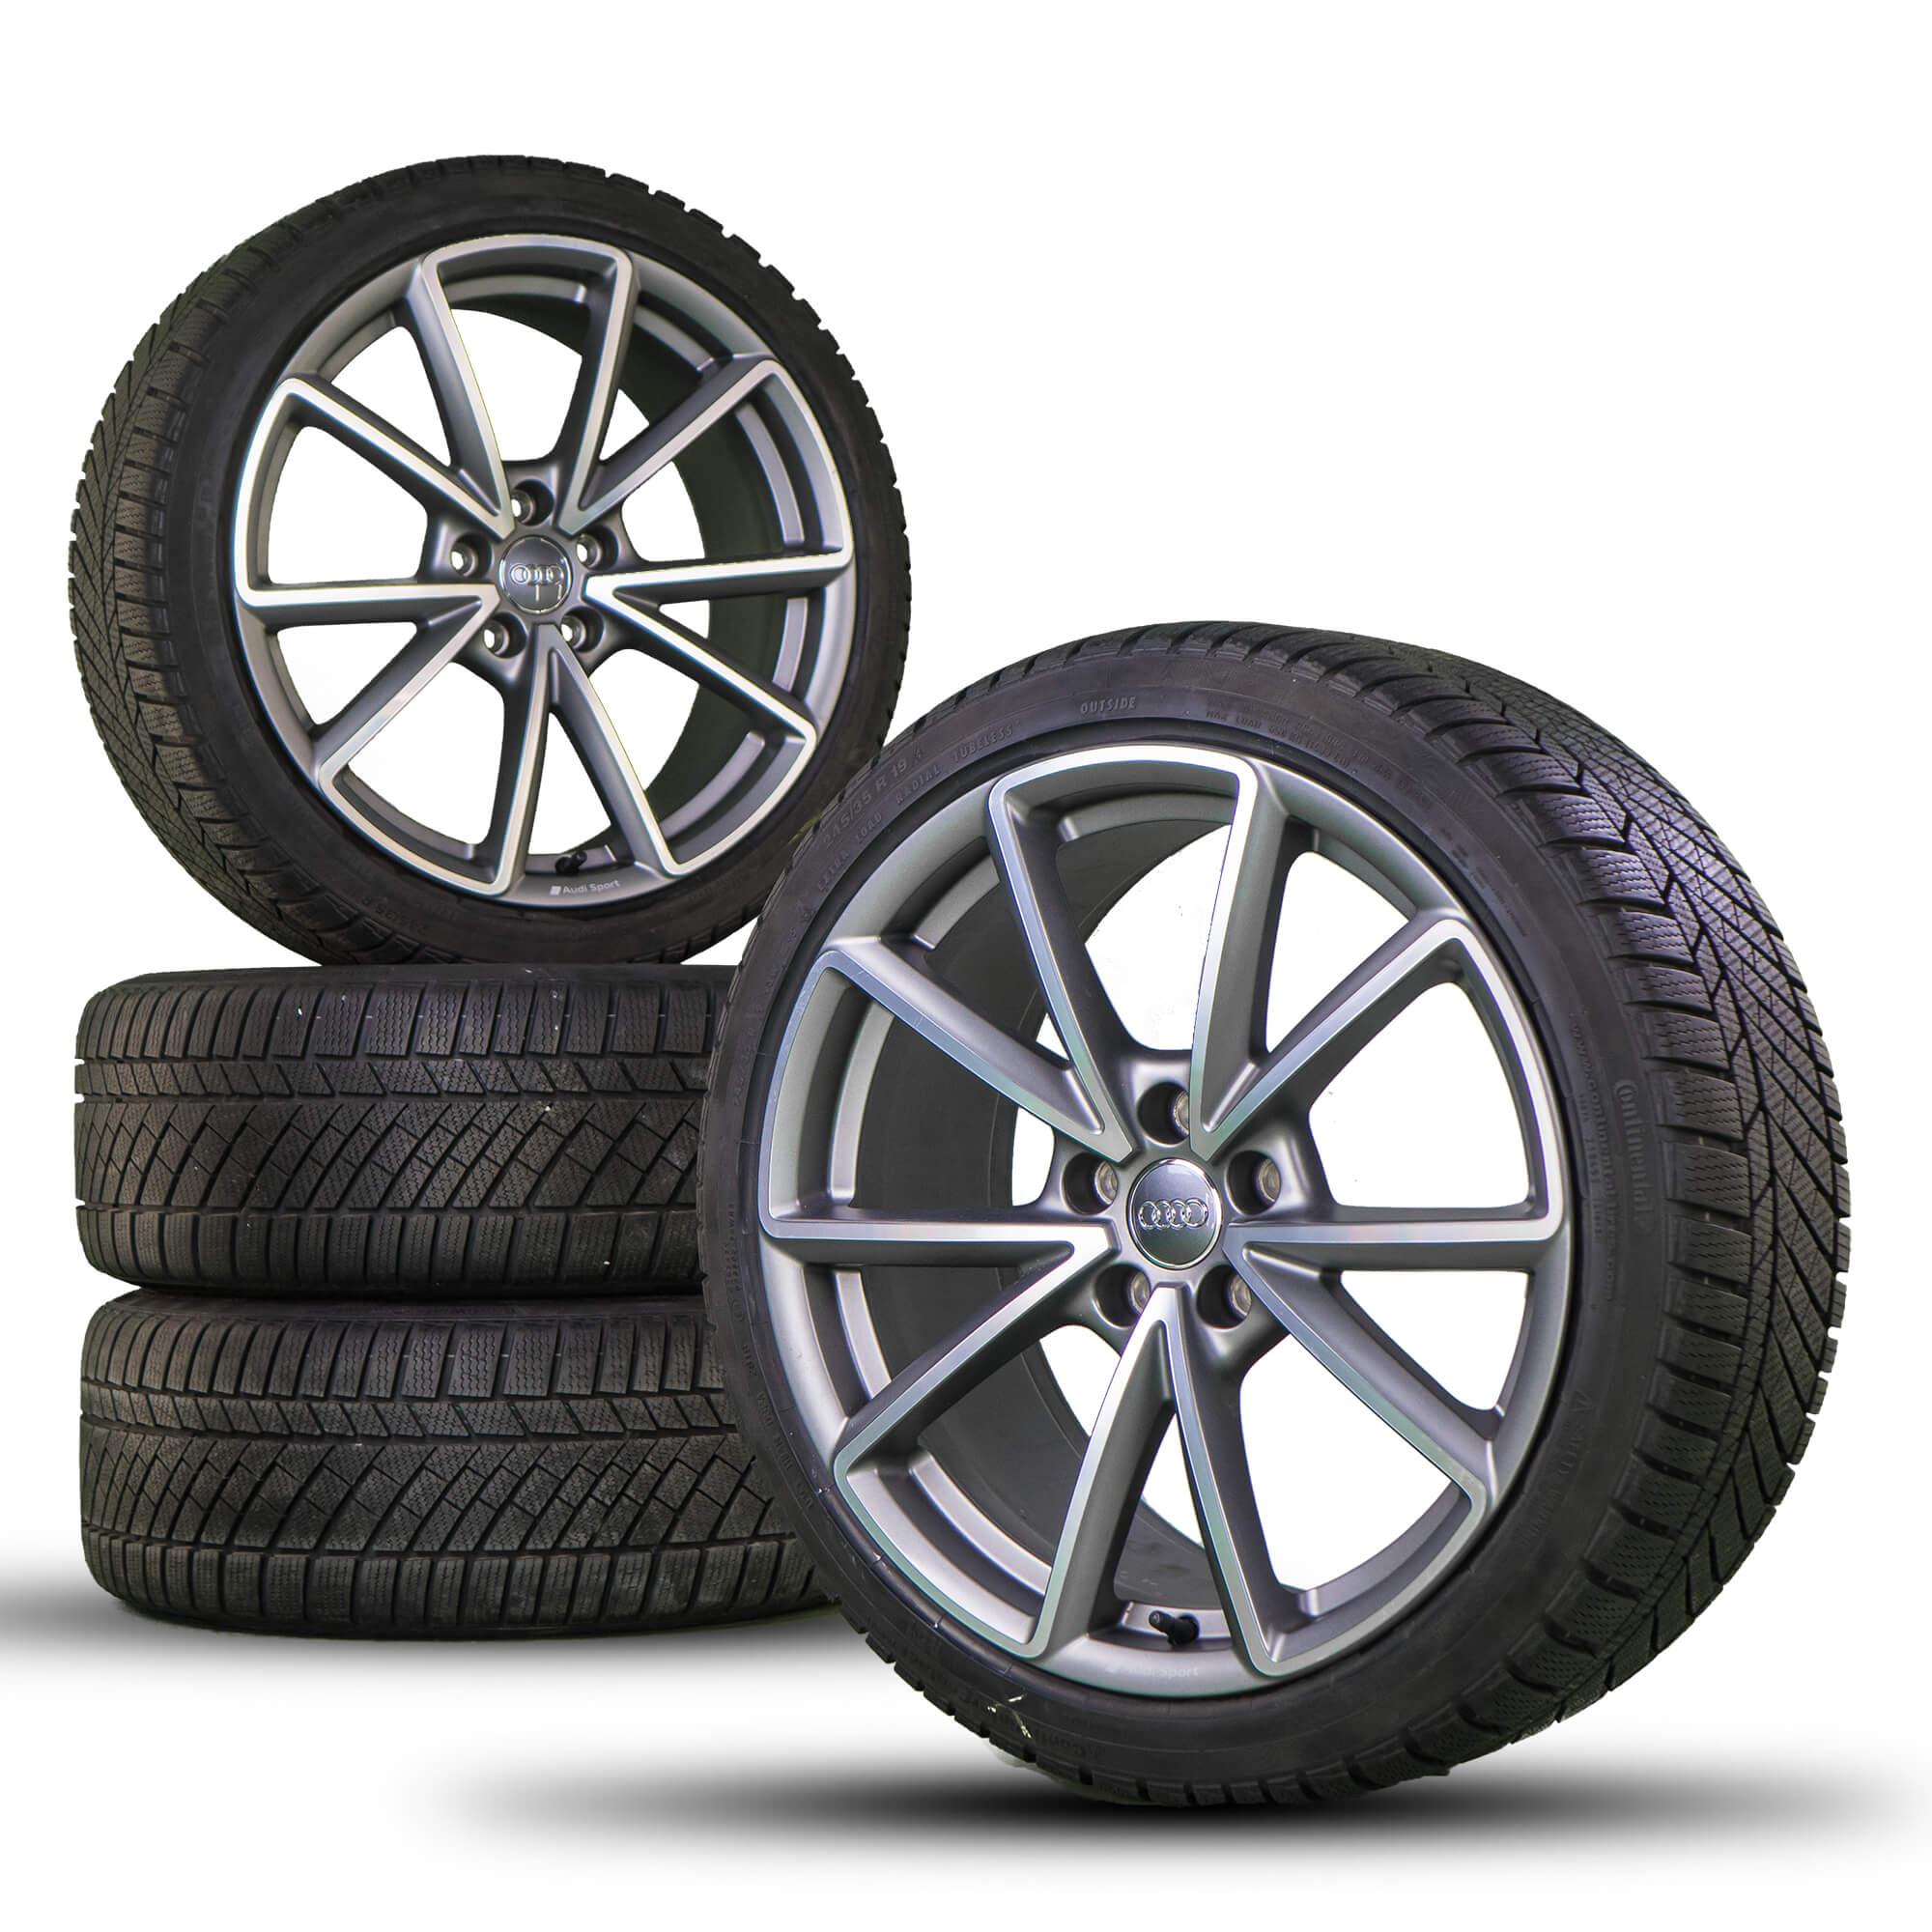 Audi A4 S4 8W 19 Inch Aluminum Rim Rims Winter Tires